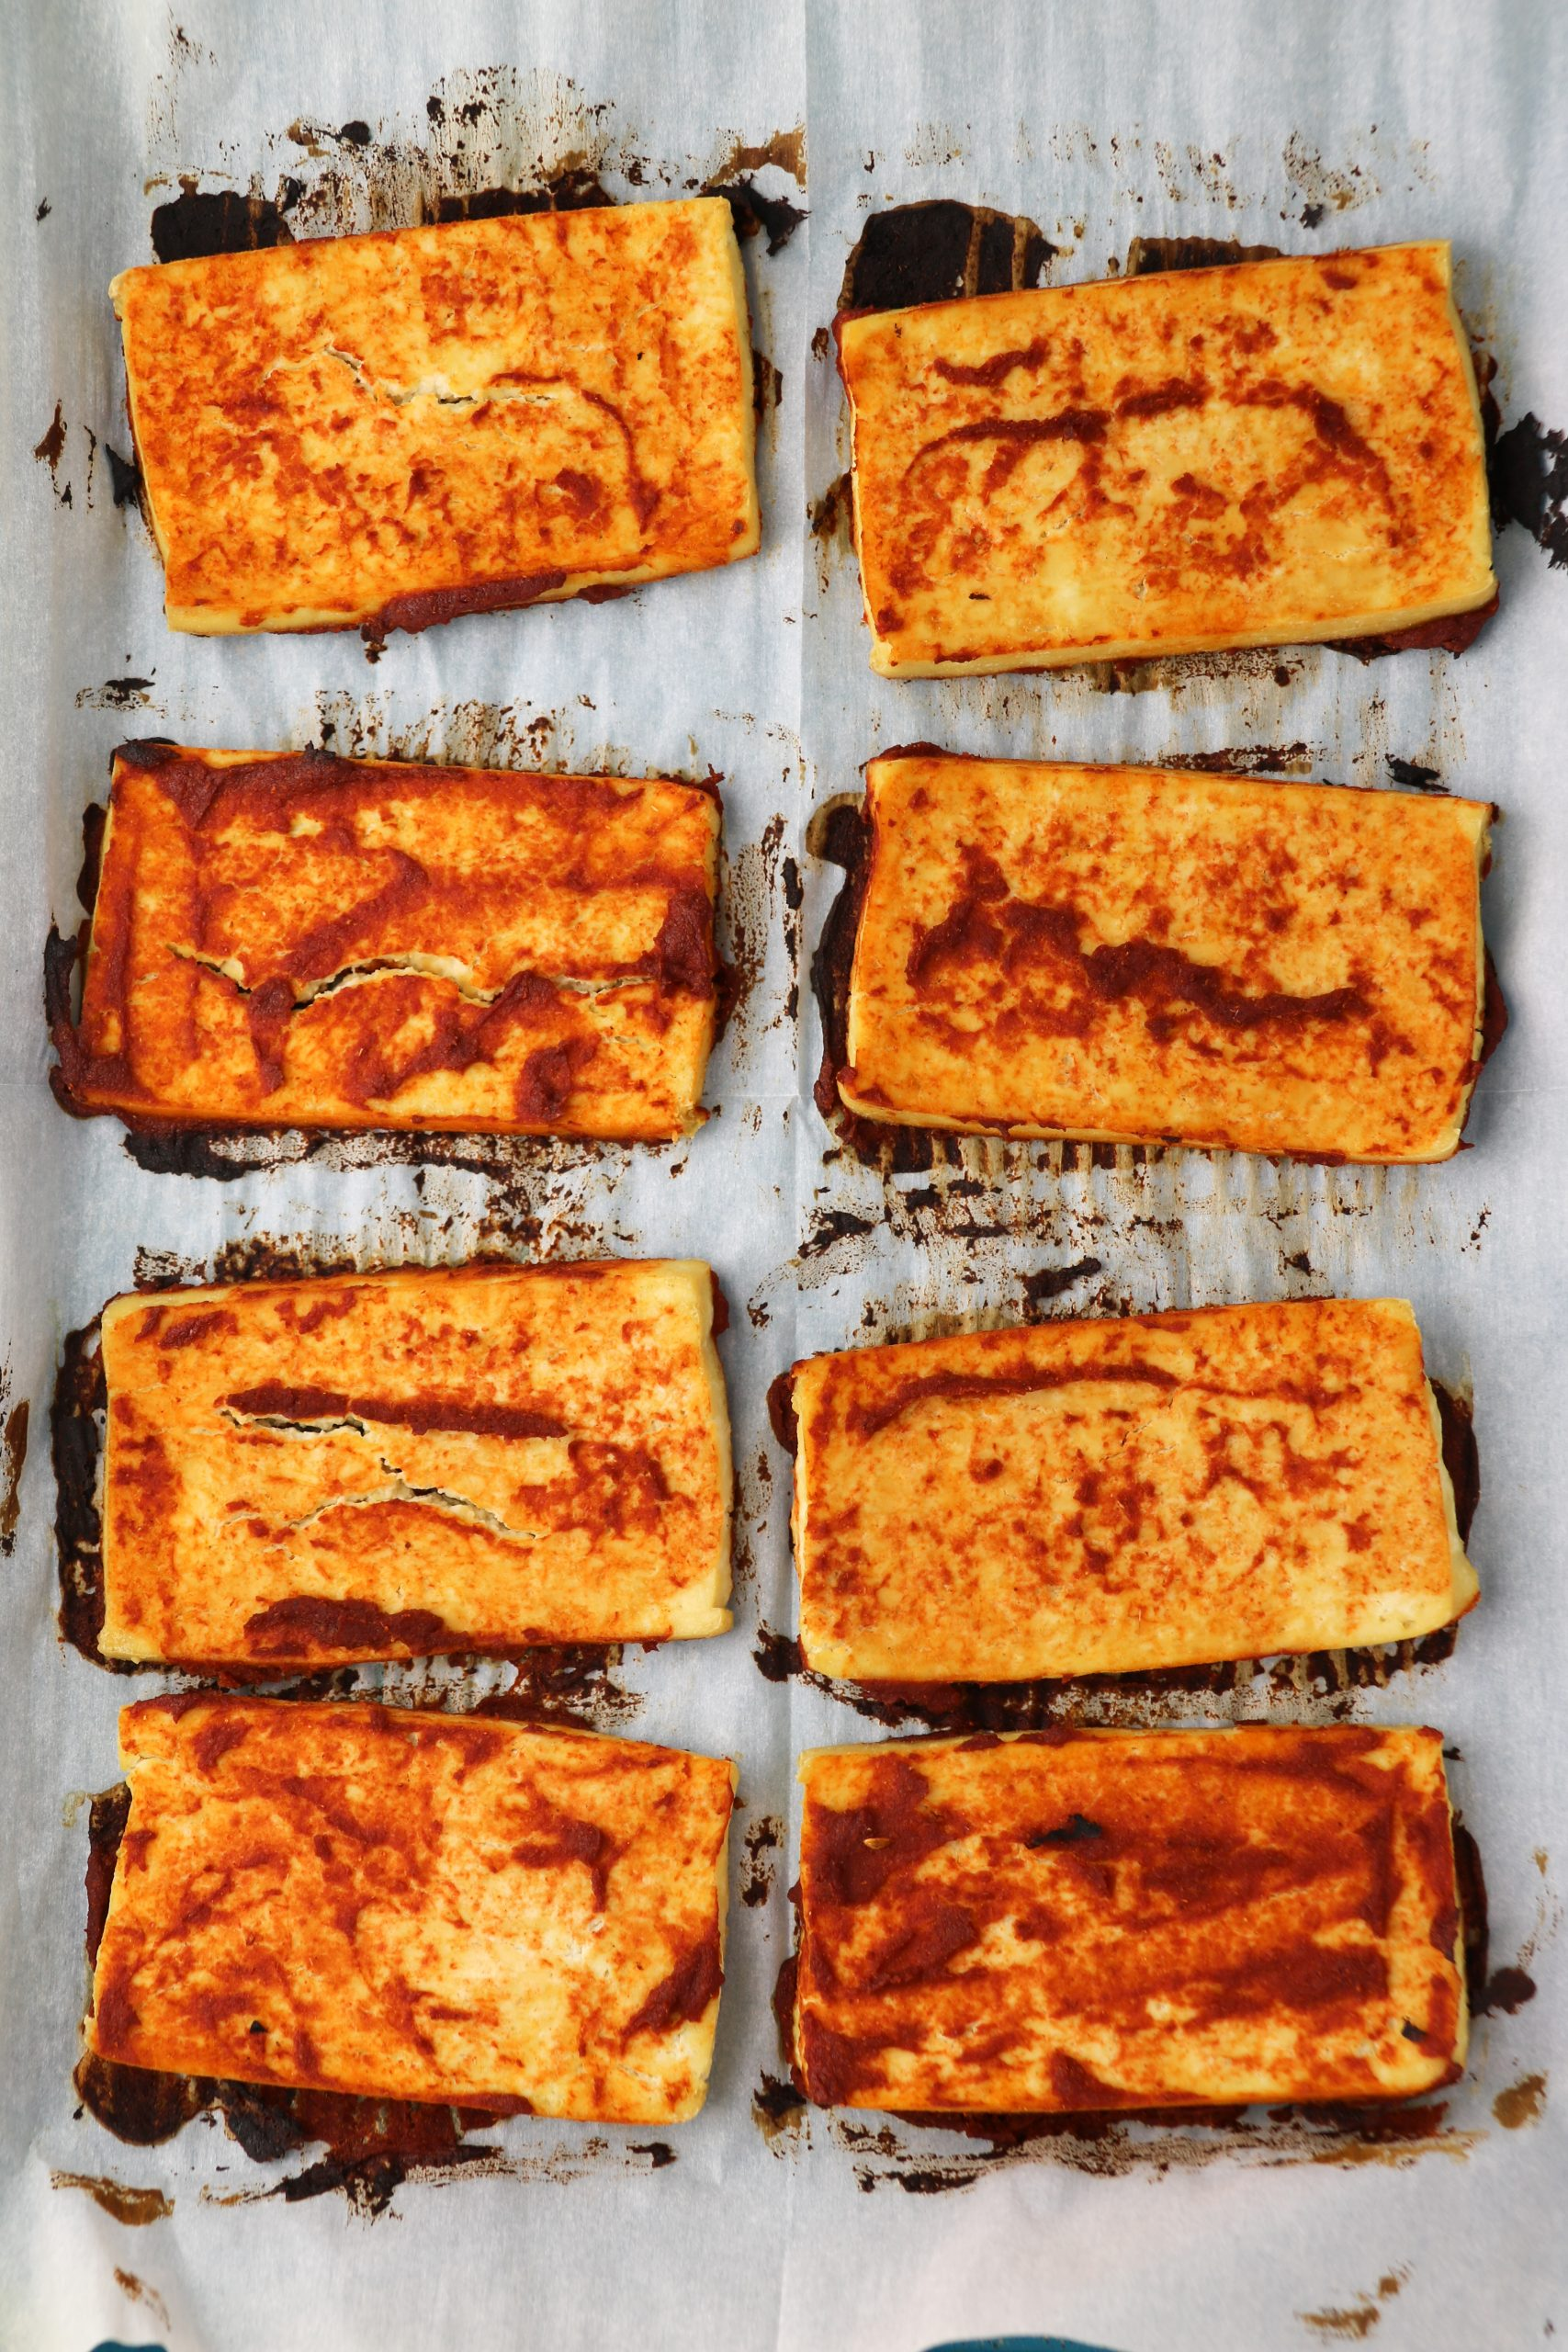 vegan plant based sandwich recipe with tofu